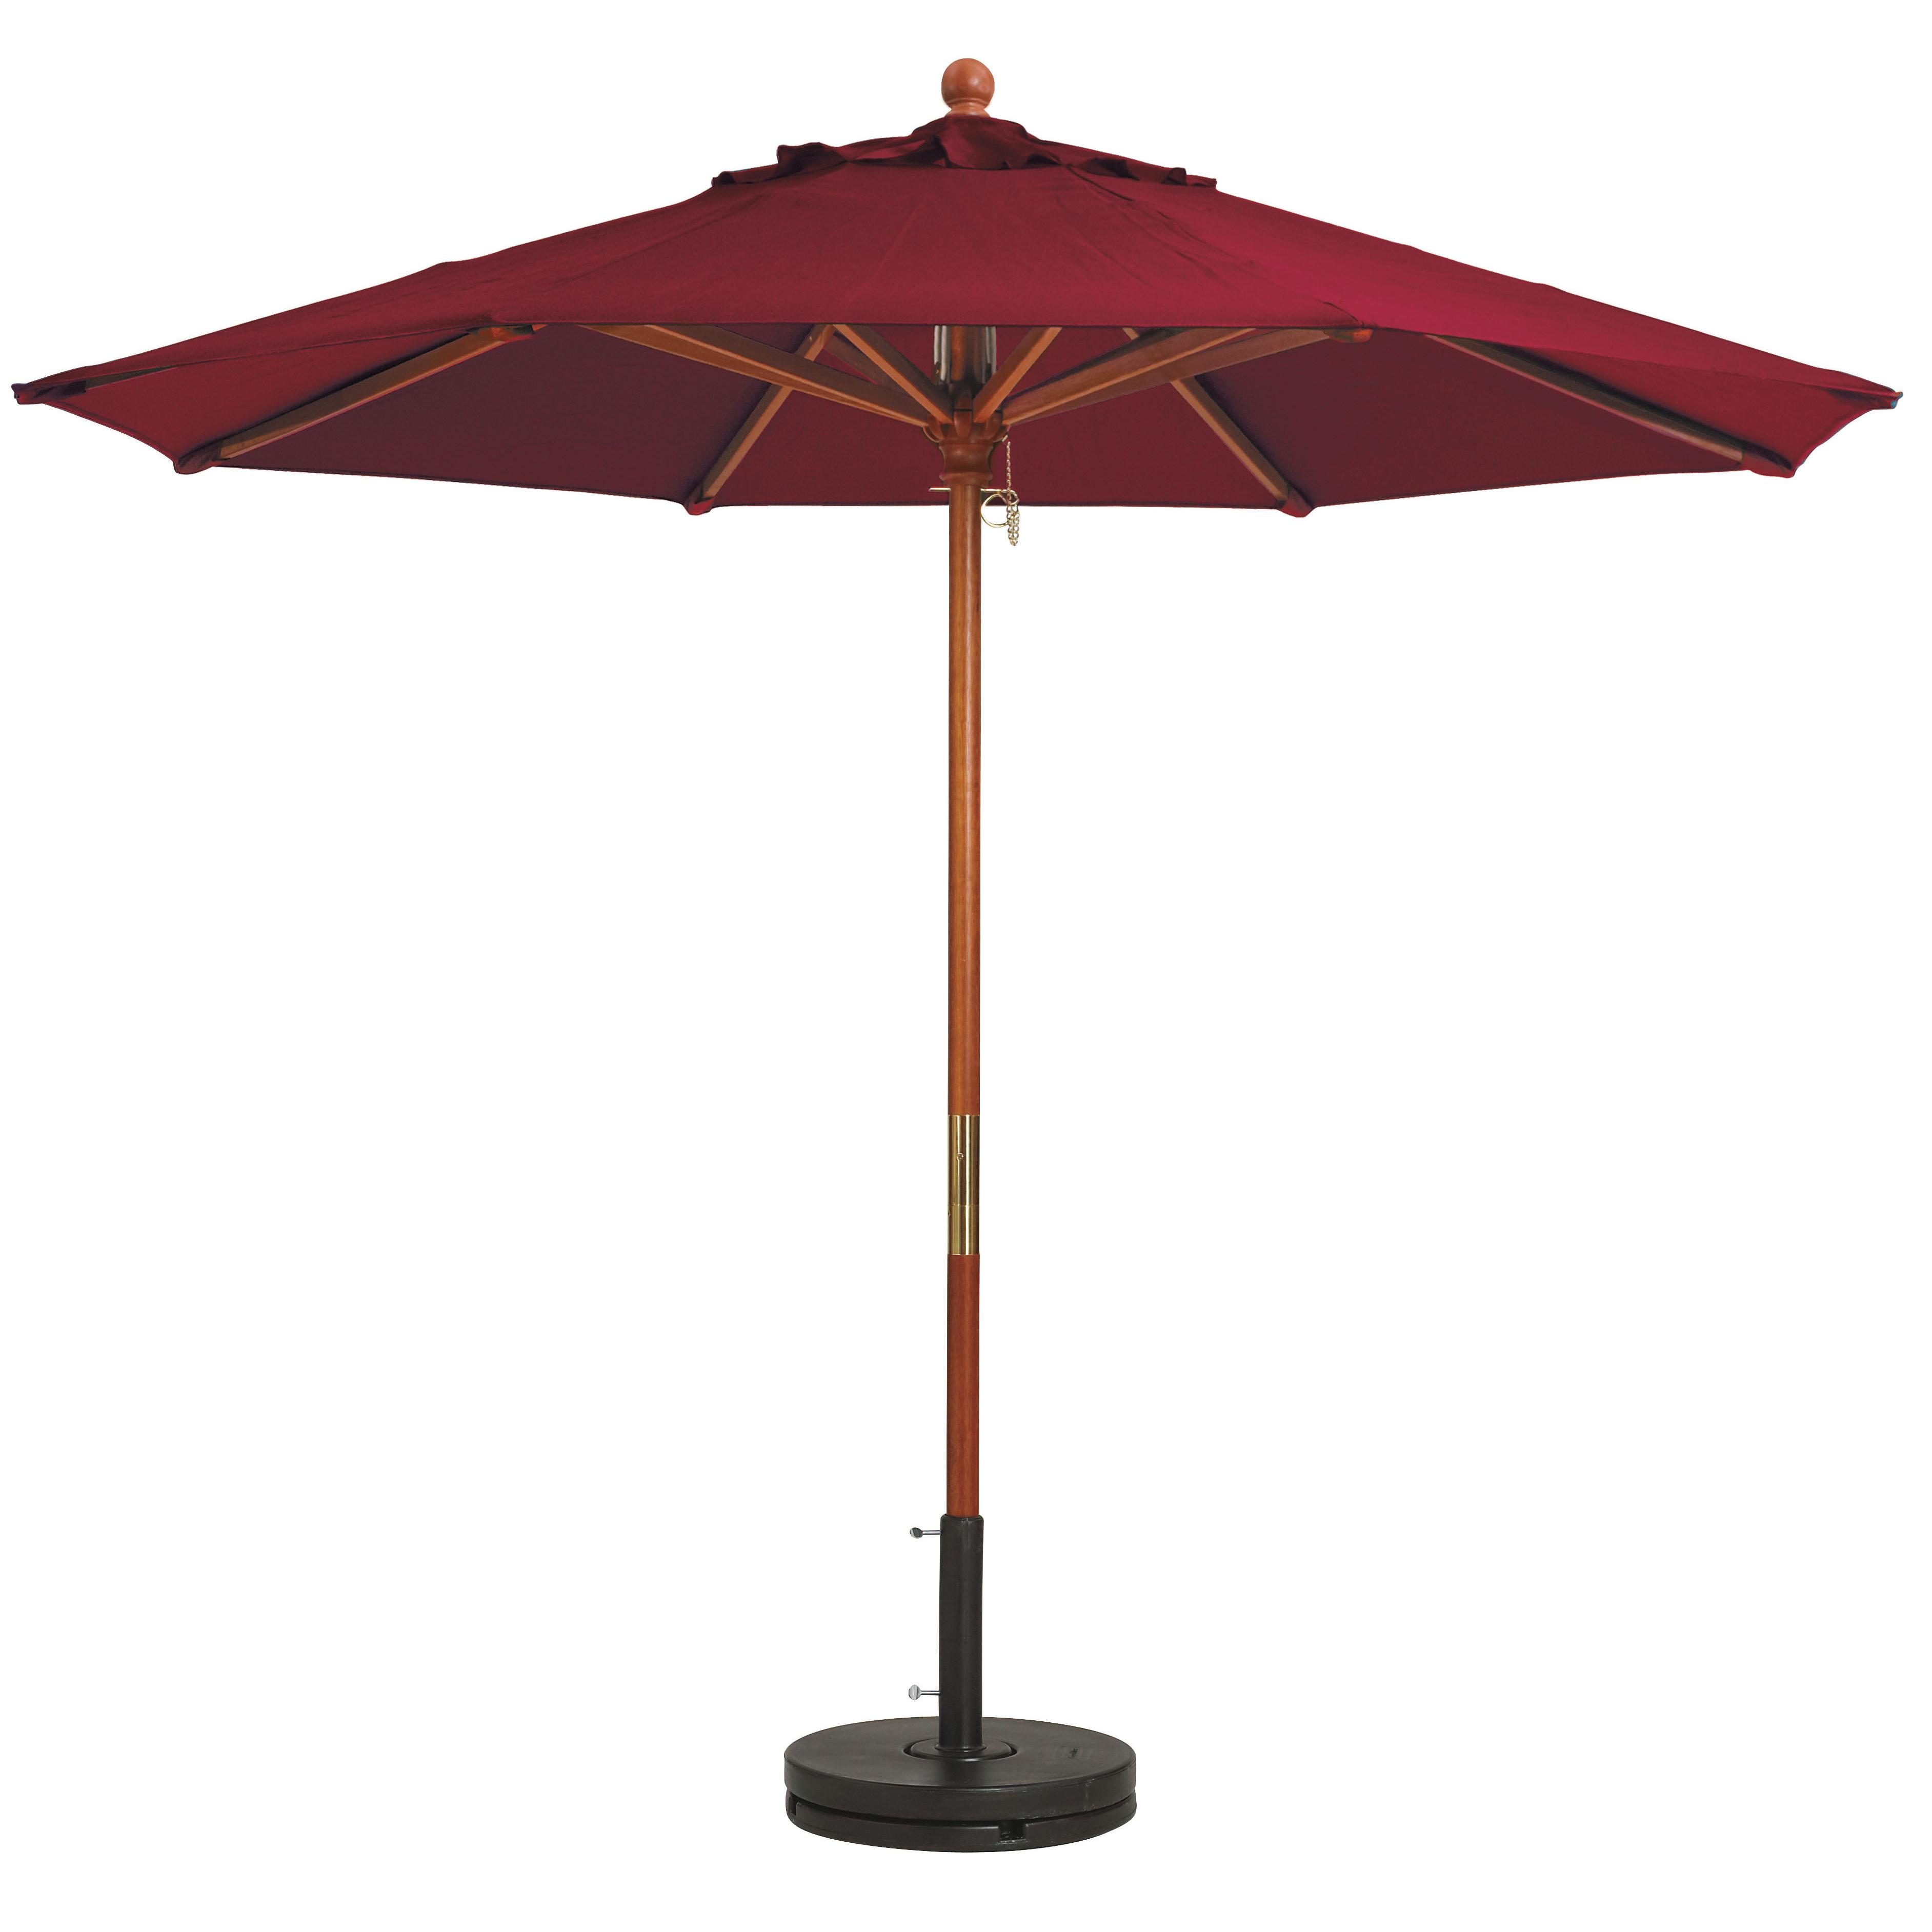 Grosfillex 98912731 umbrella